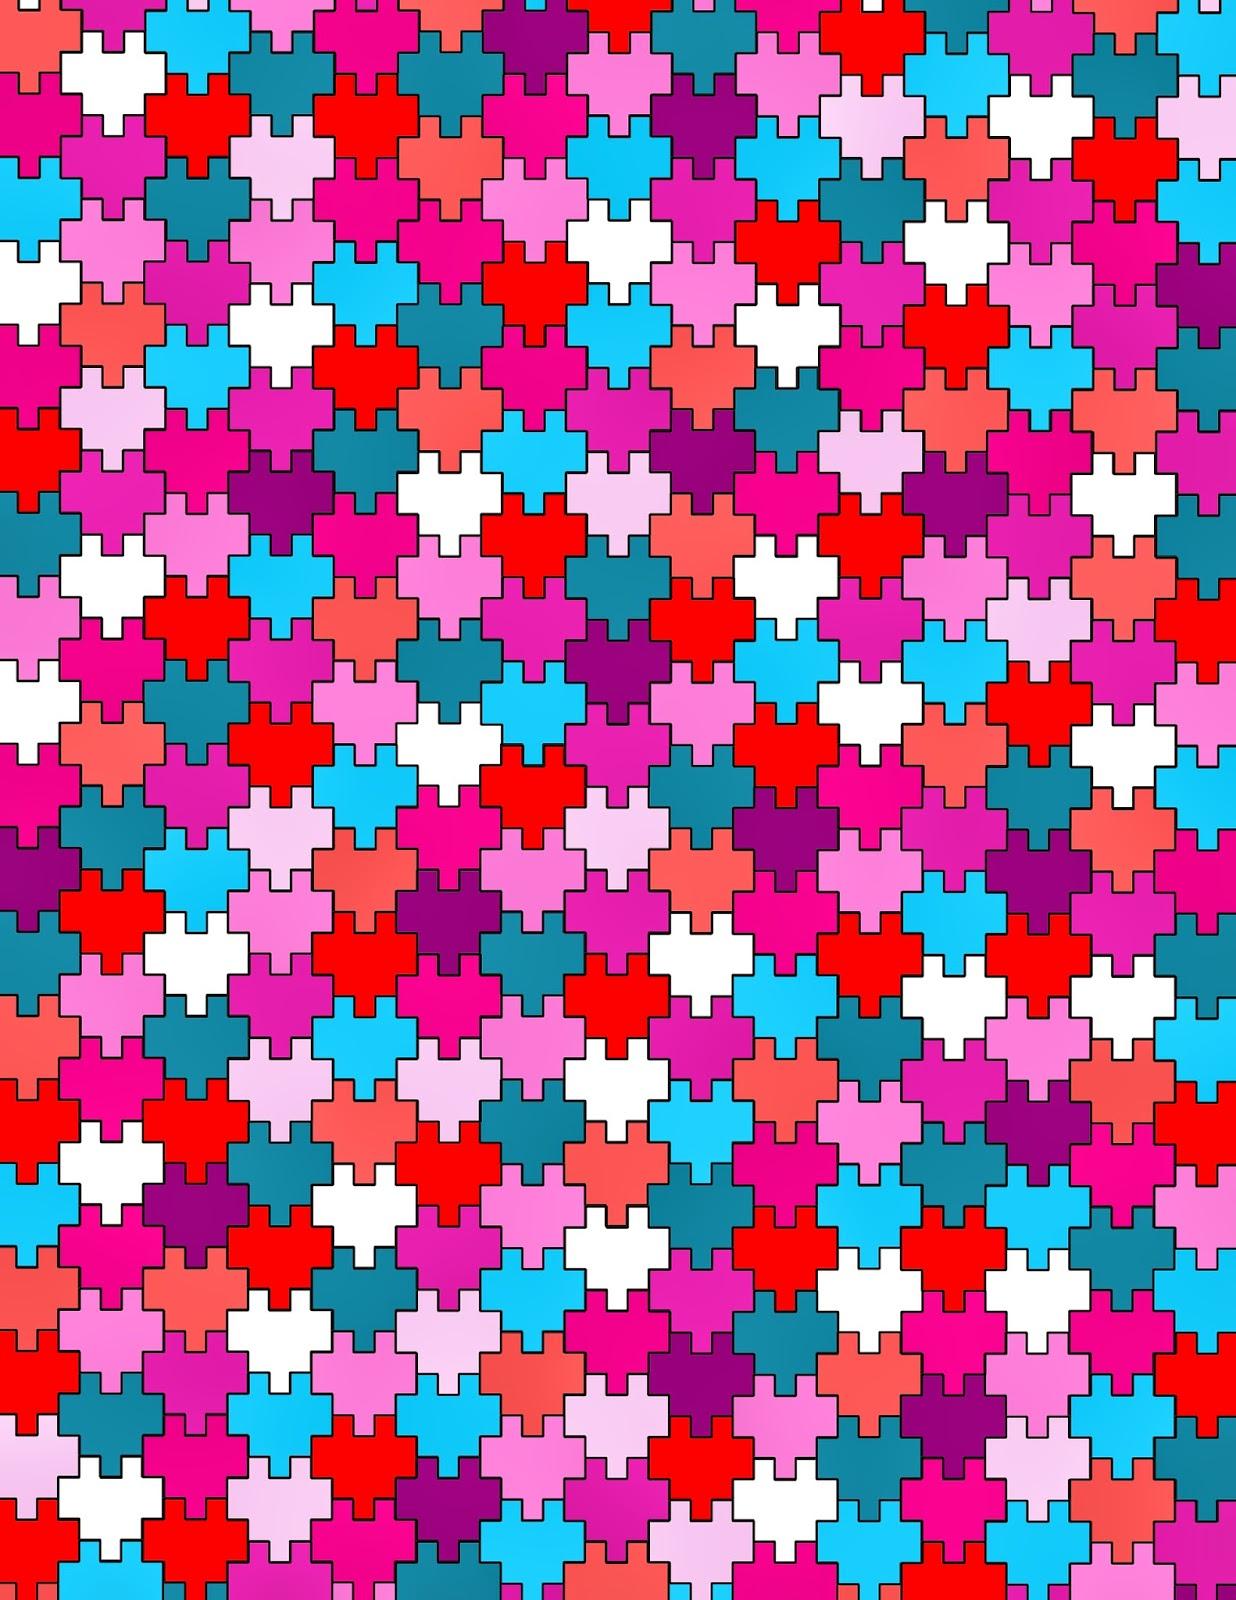 minecraft pixel heart tessellation free printable